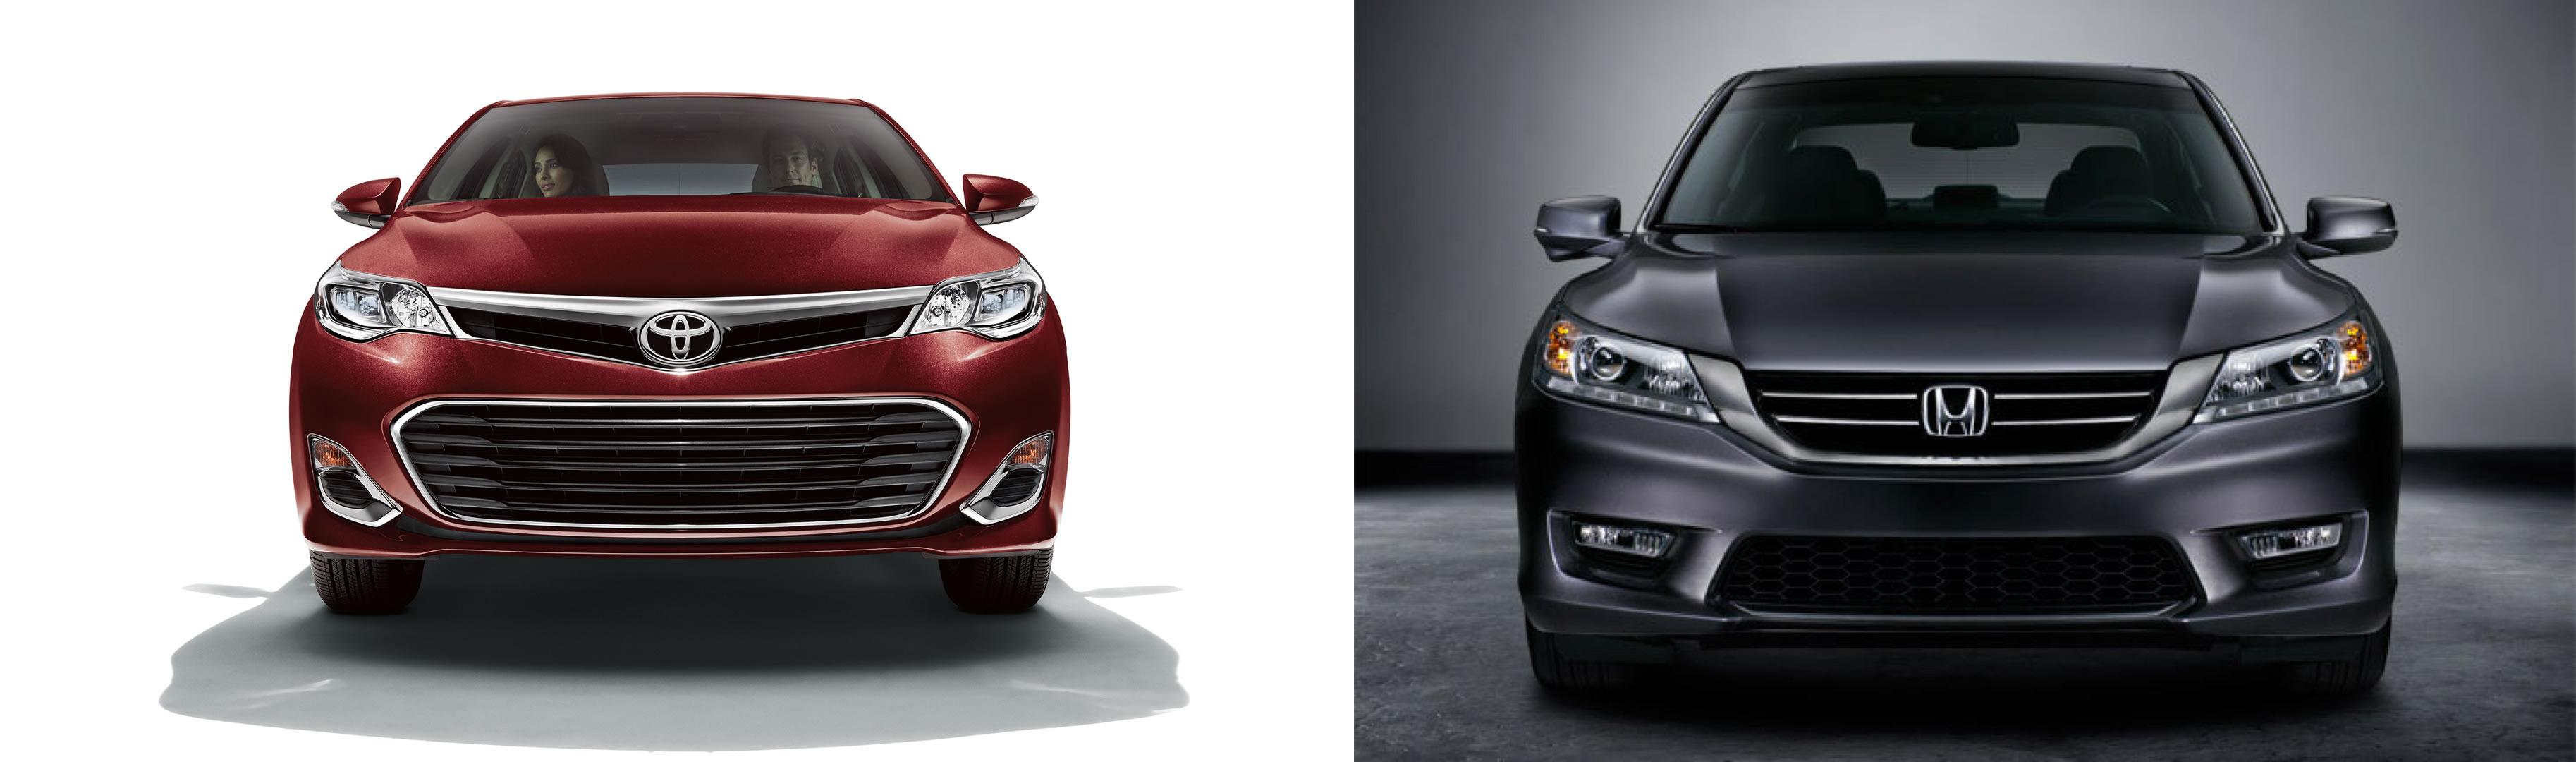 2015 Toyota Avalon vs. 2015 Honda Accord - Limbaugh Toyota ...